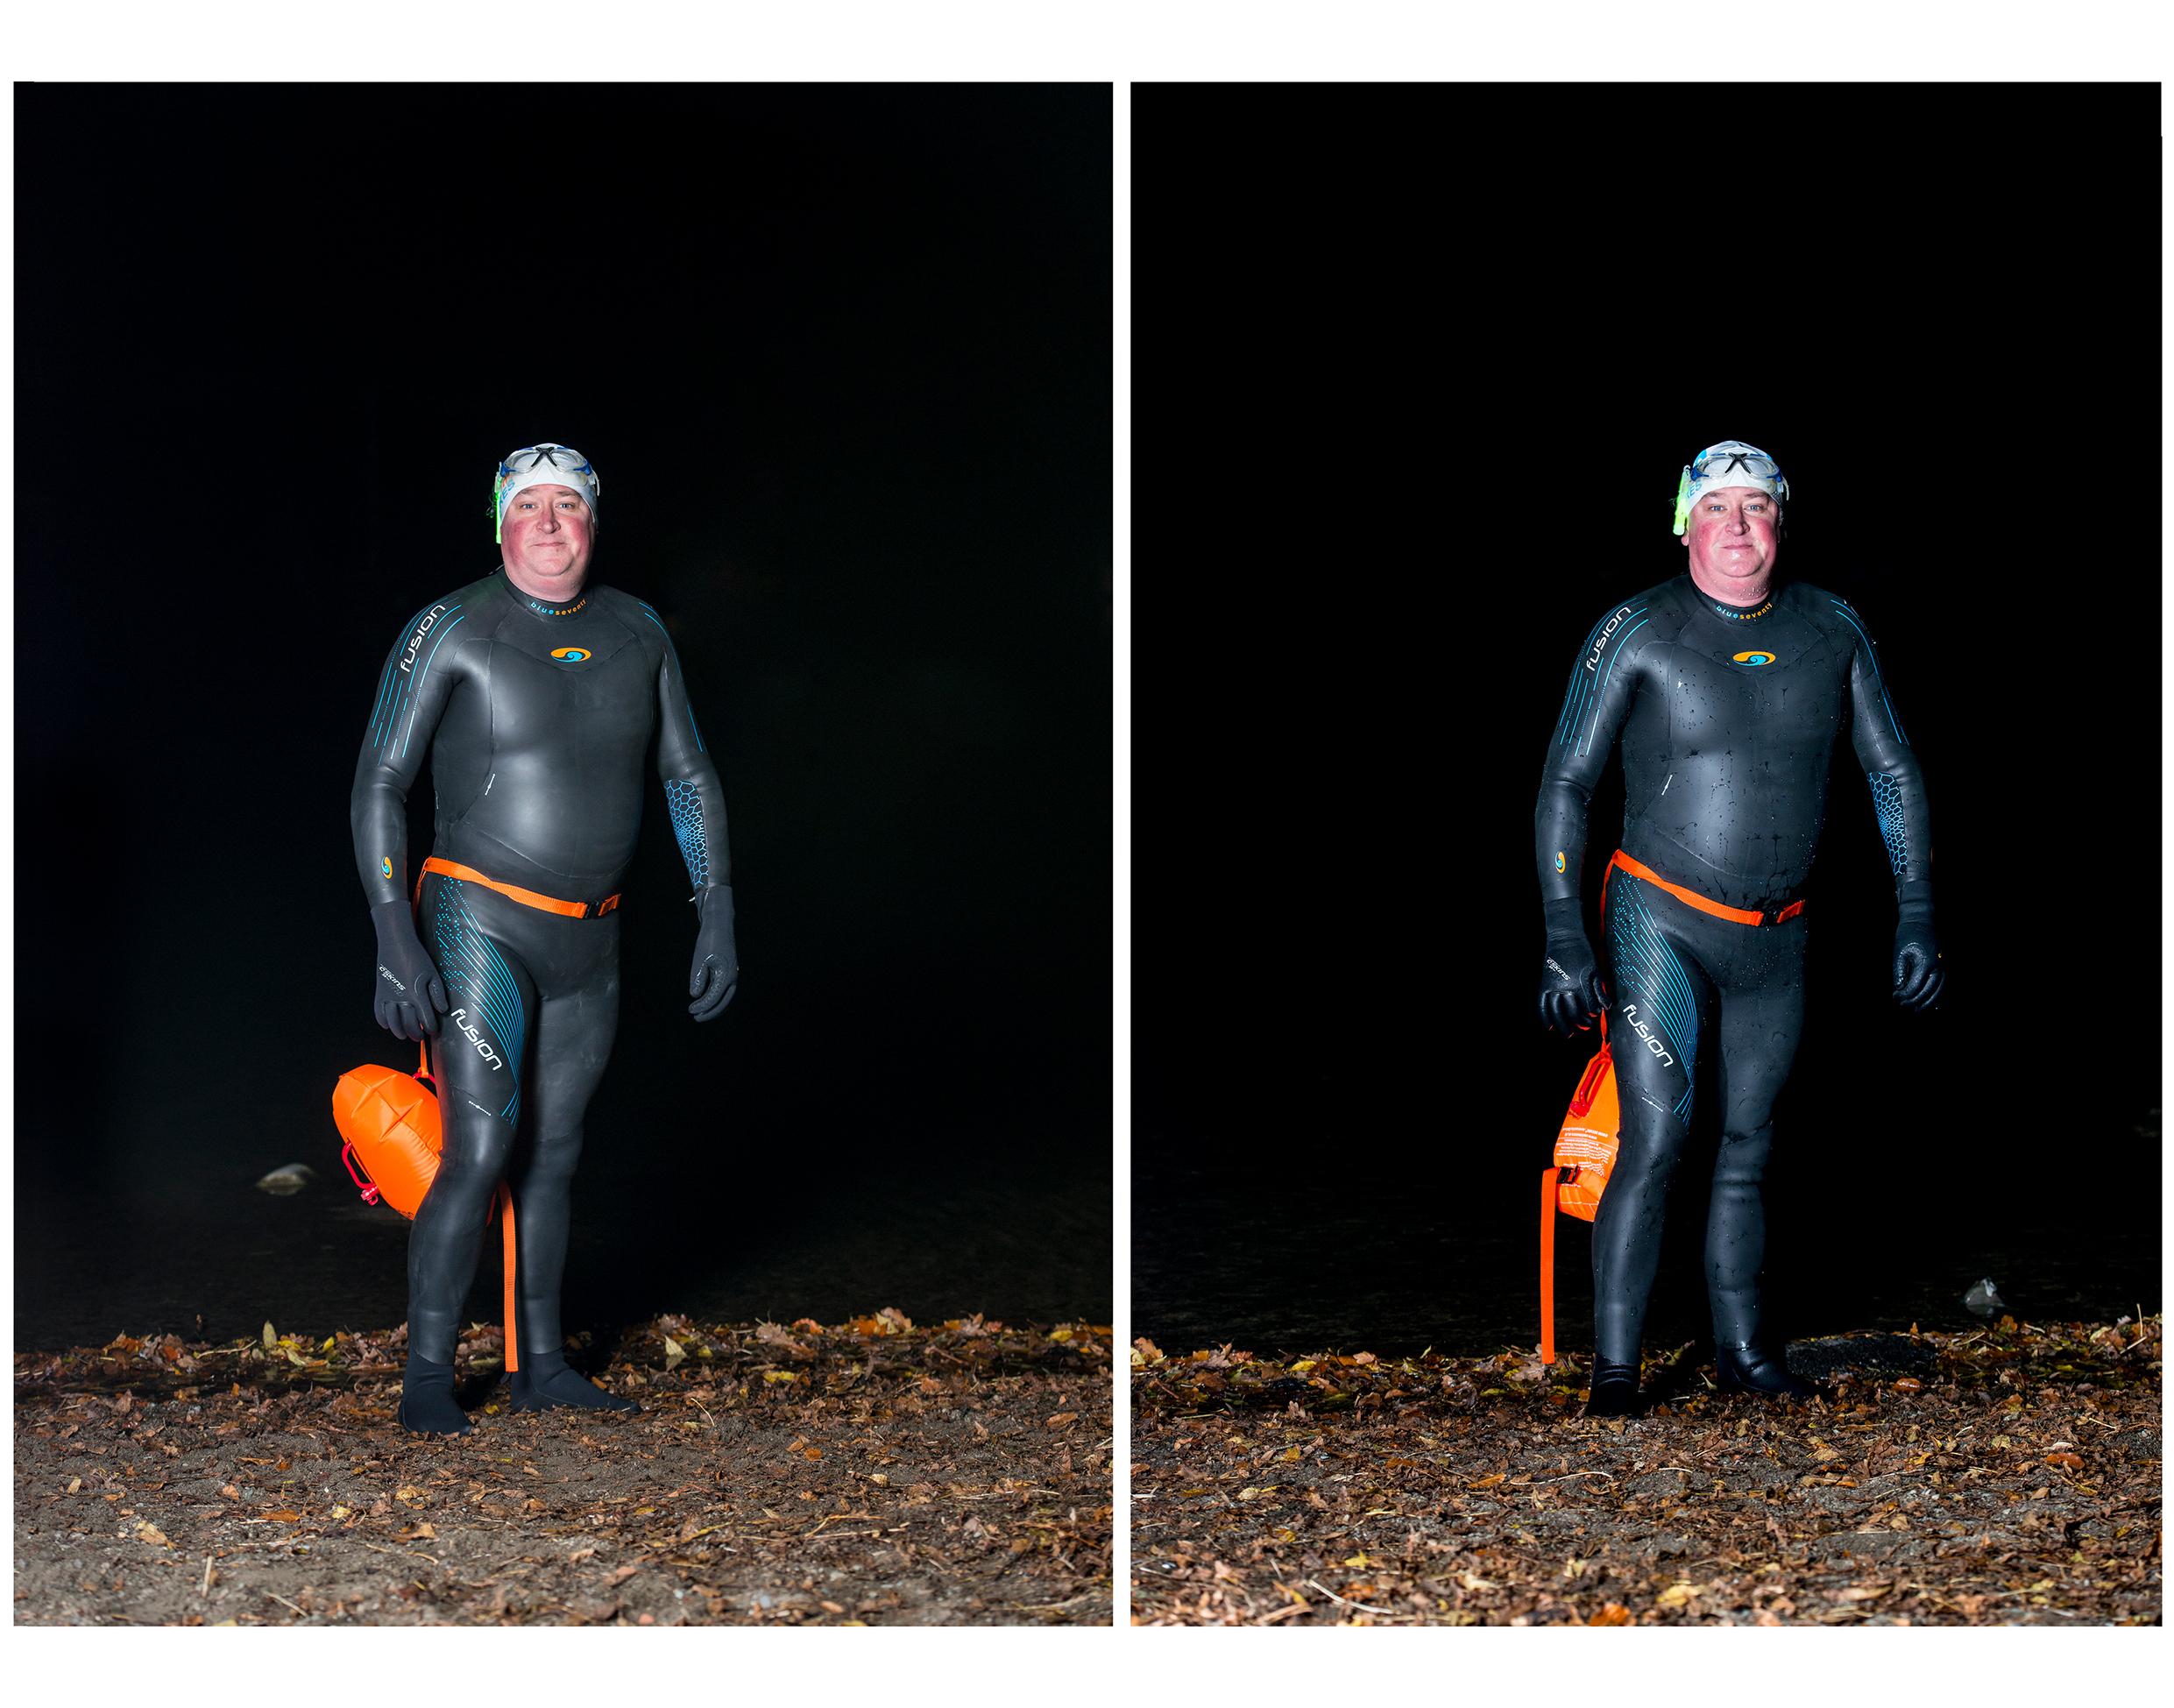 9_SwimTheLakes_28.10.16_AndyHughes.jpg